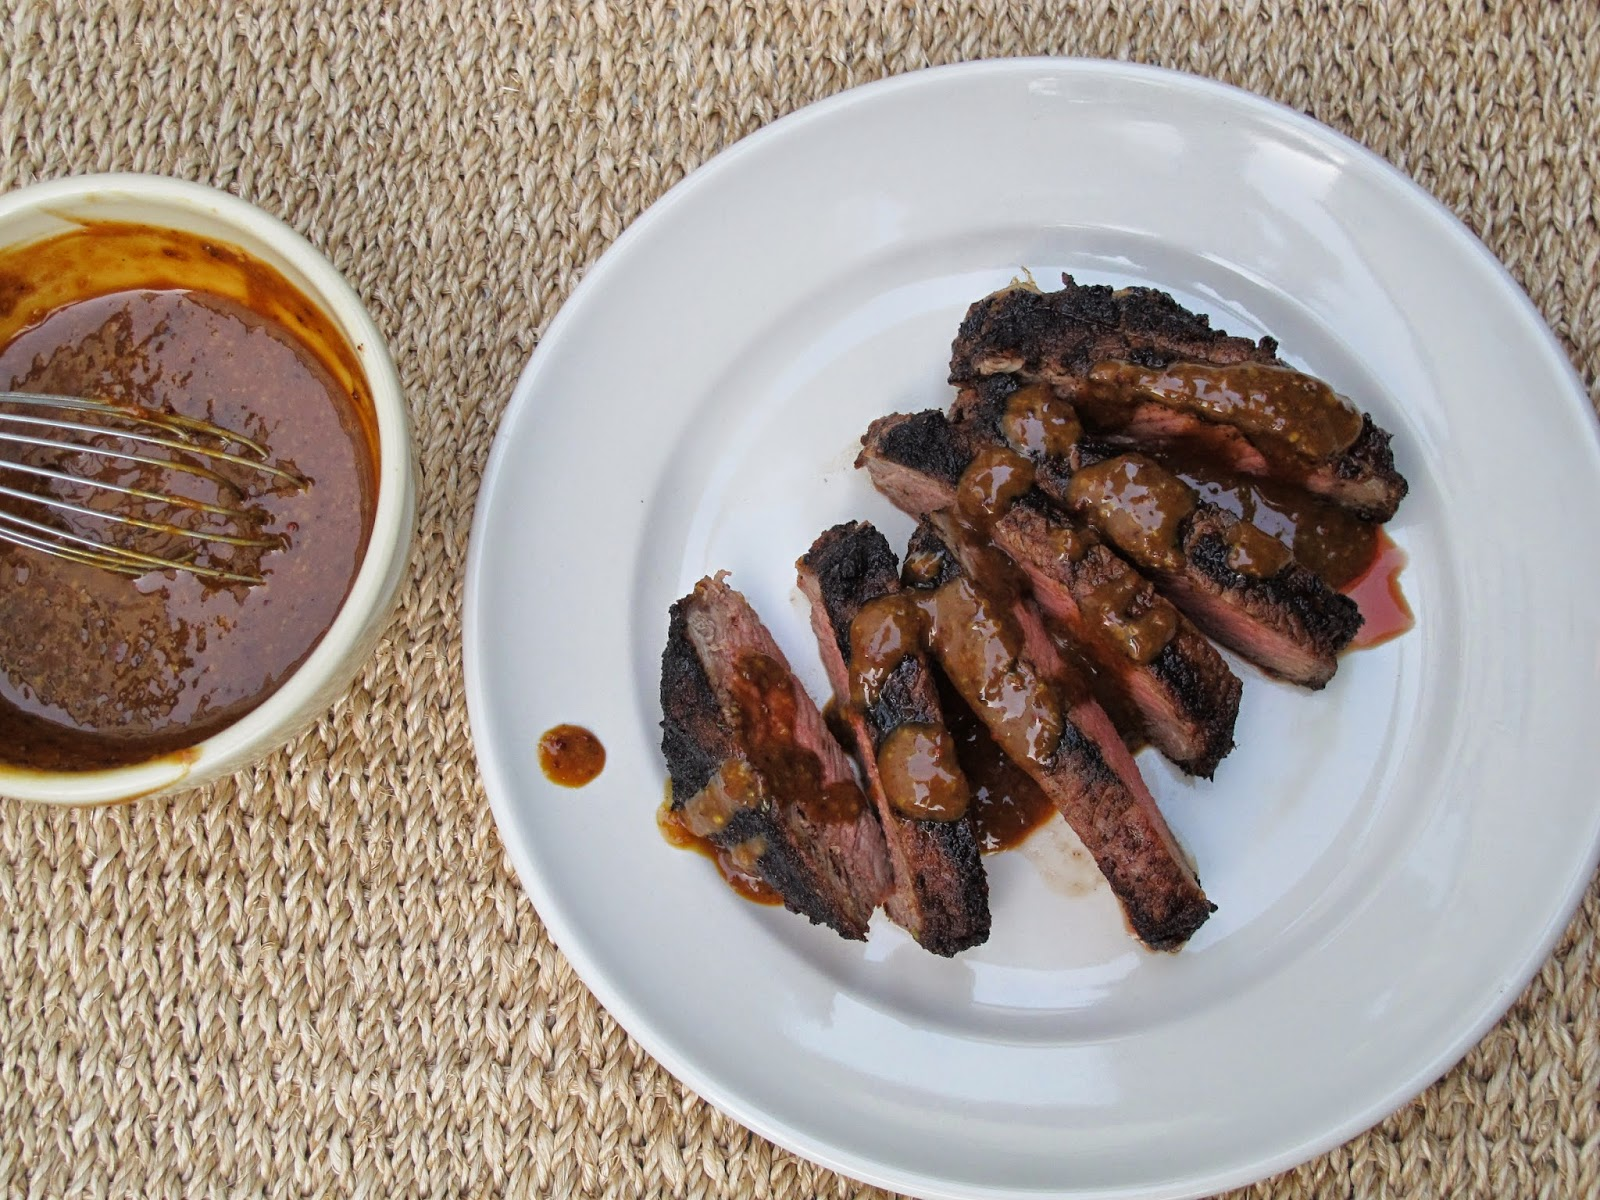 Grilled Rib Eye Bar American Steak Sauce